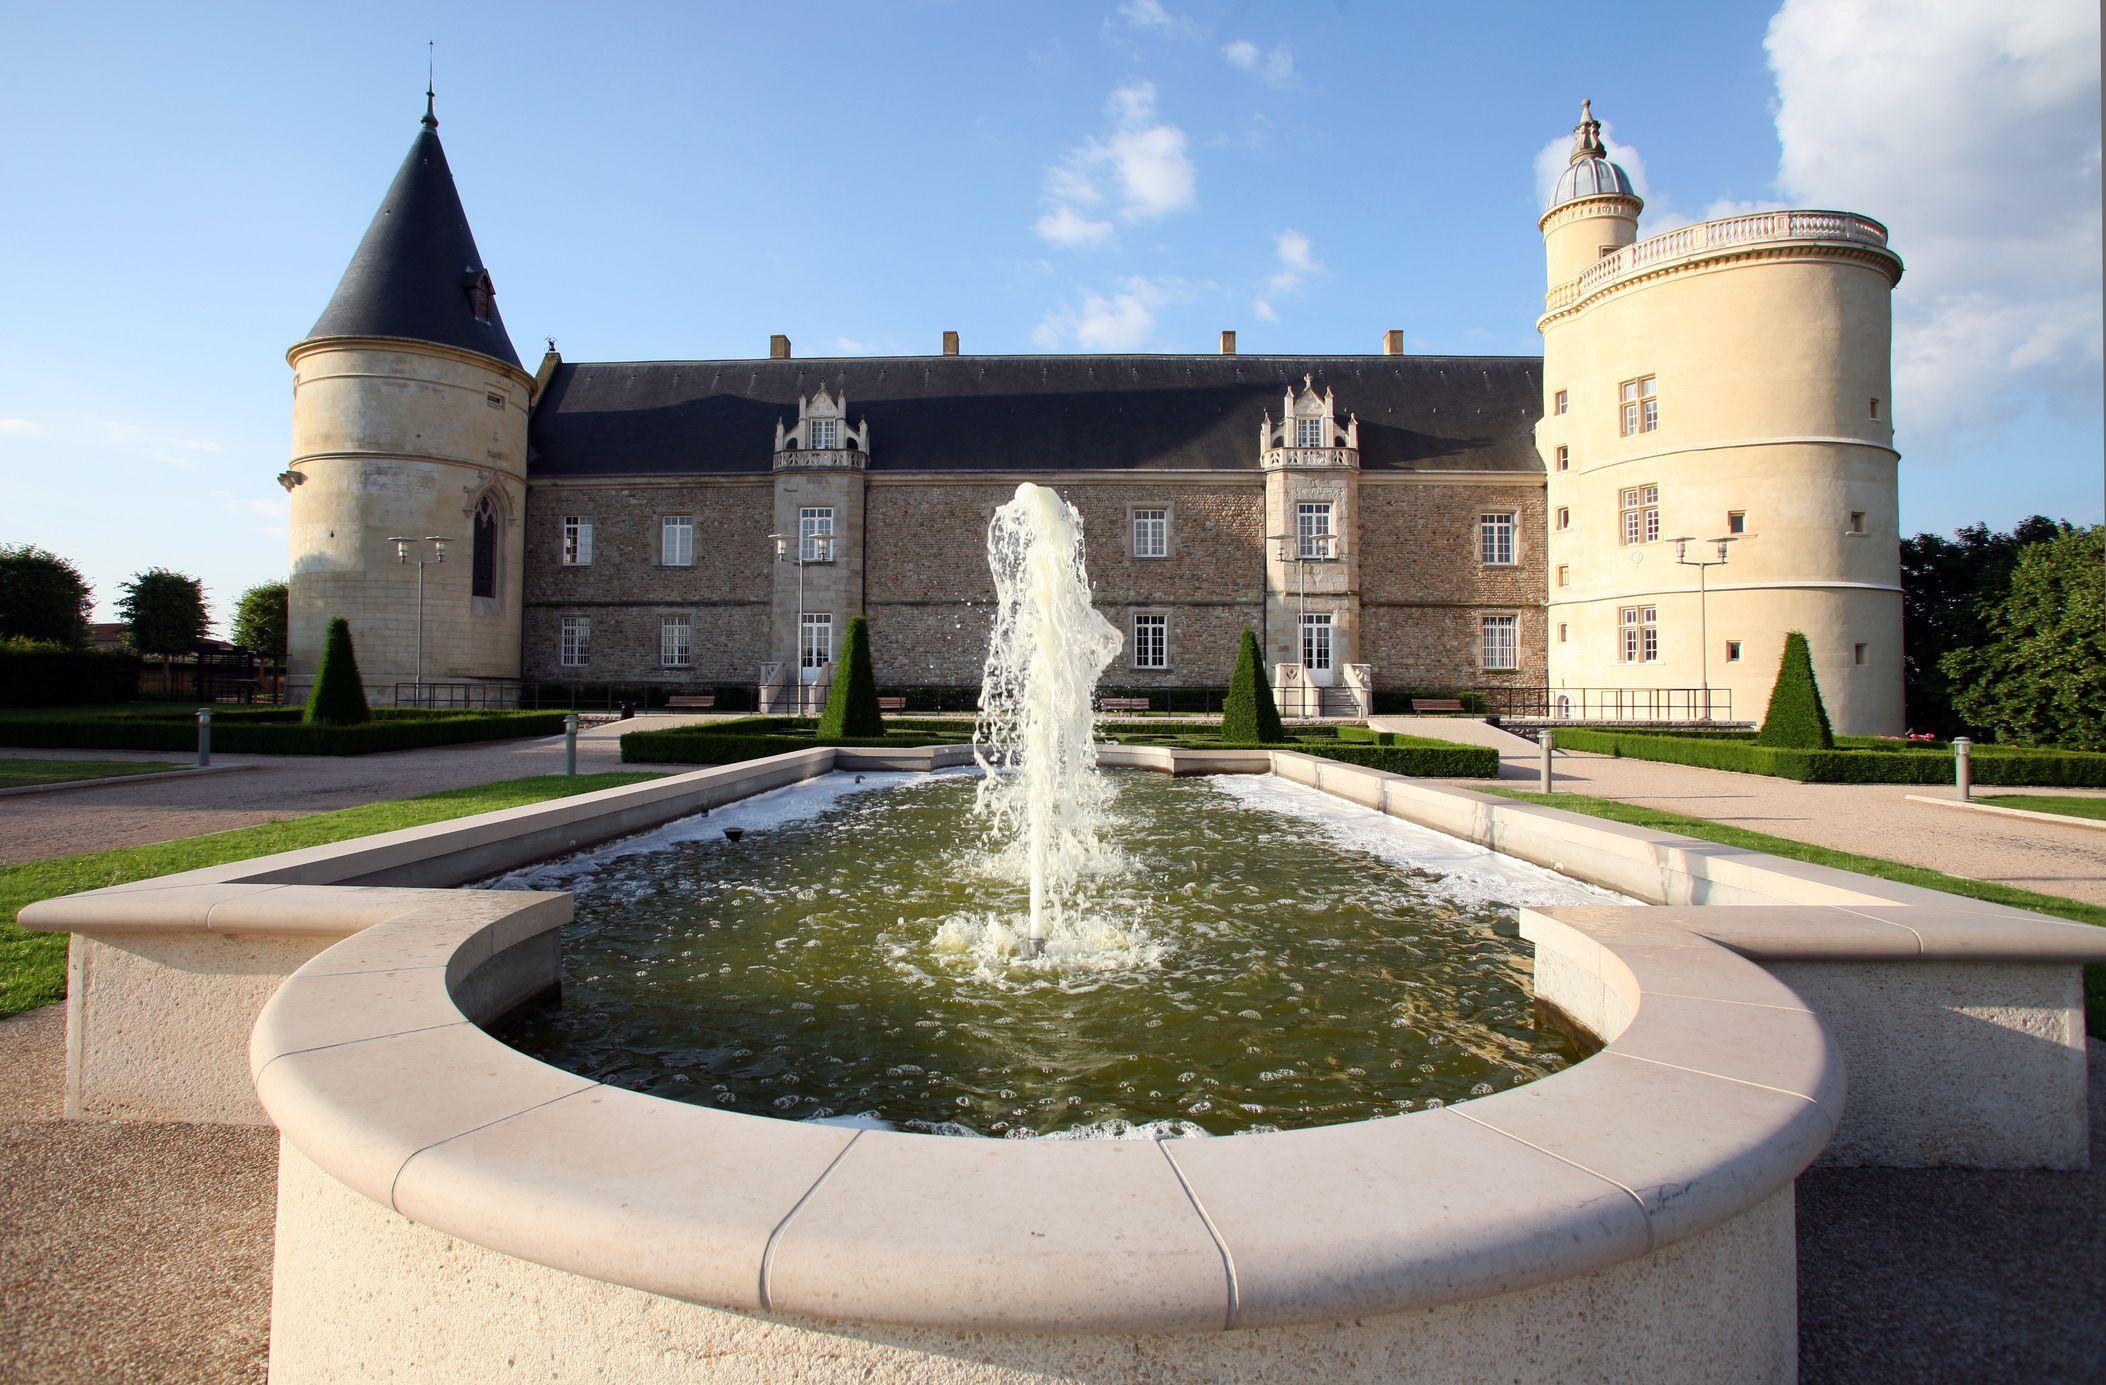 Crédit image : http://www.chateau-boutheon.com/